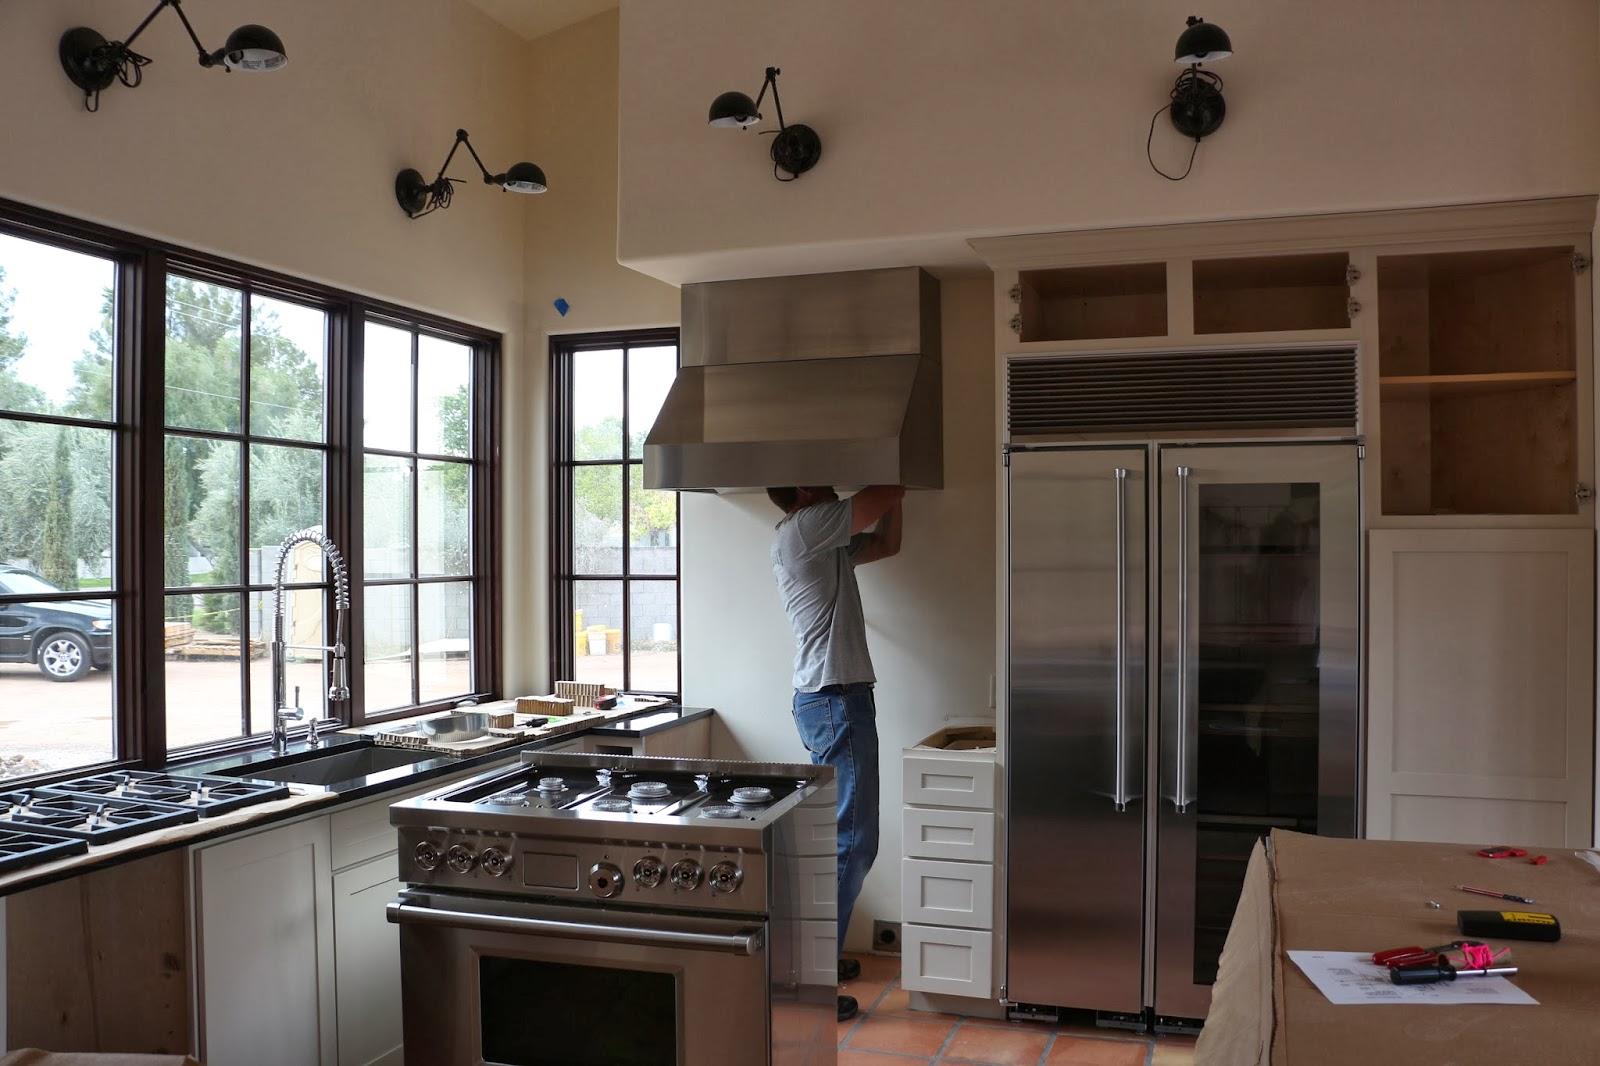 proliner ange hood, wolf stove, marvel refrigerator